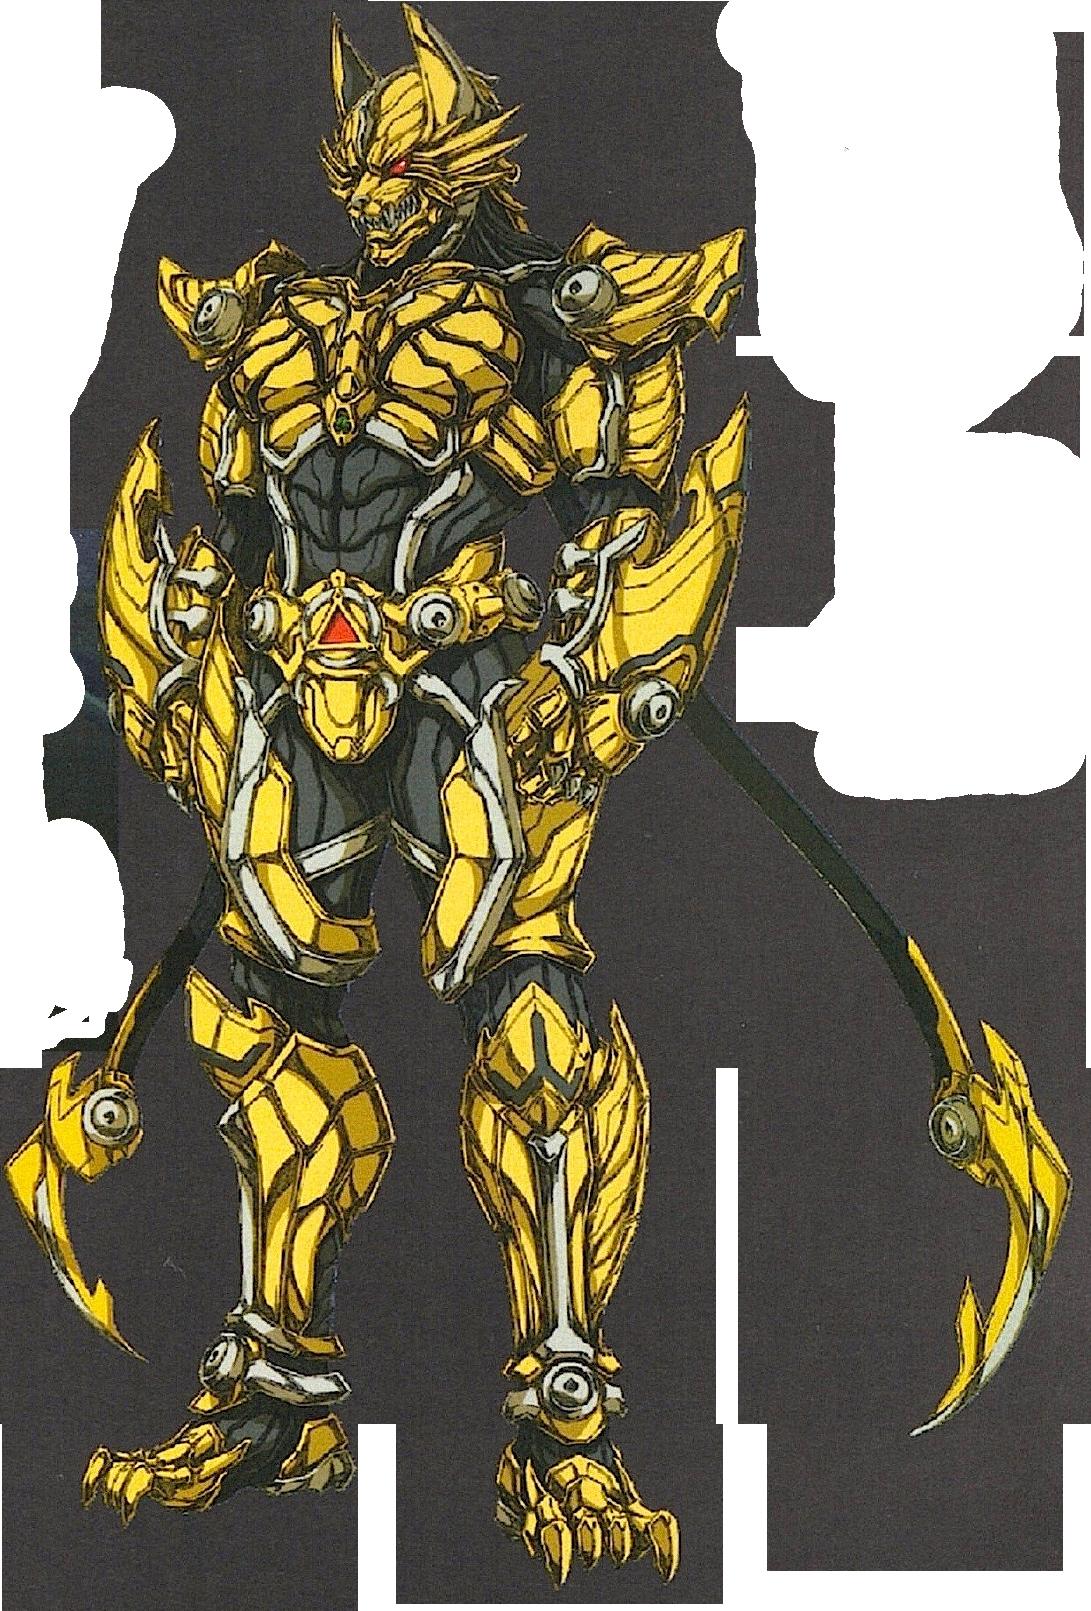 Garo (Anime Armor)/VL